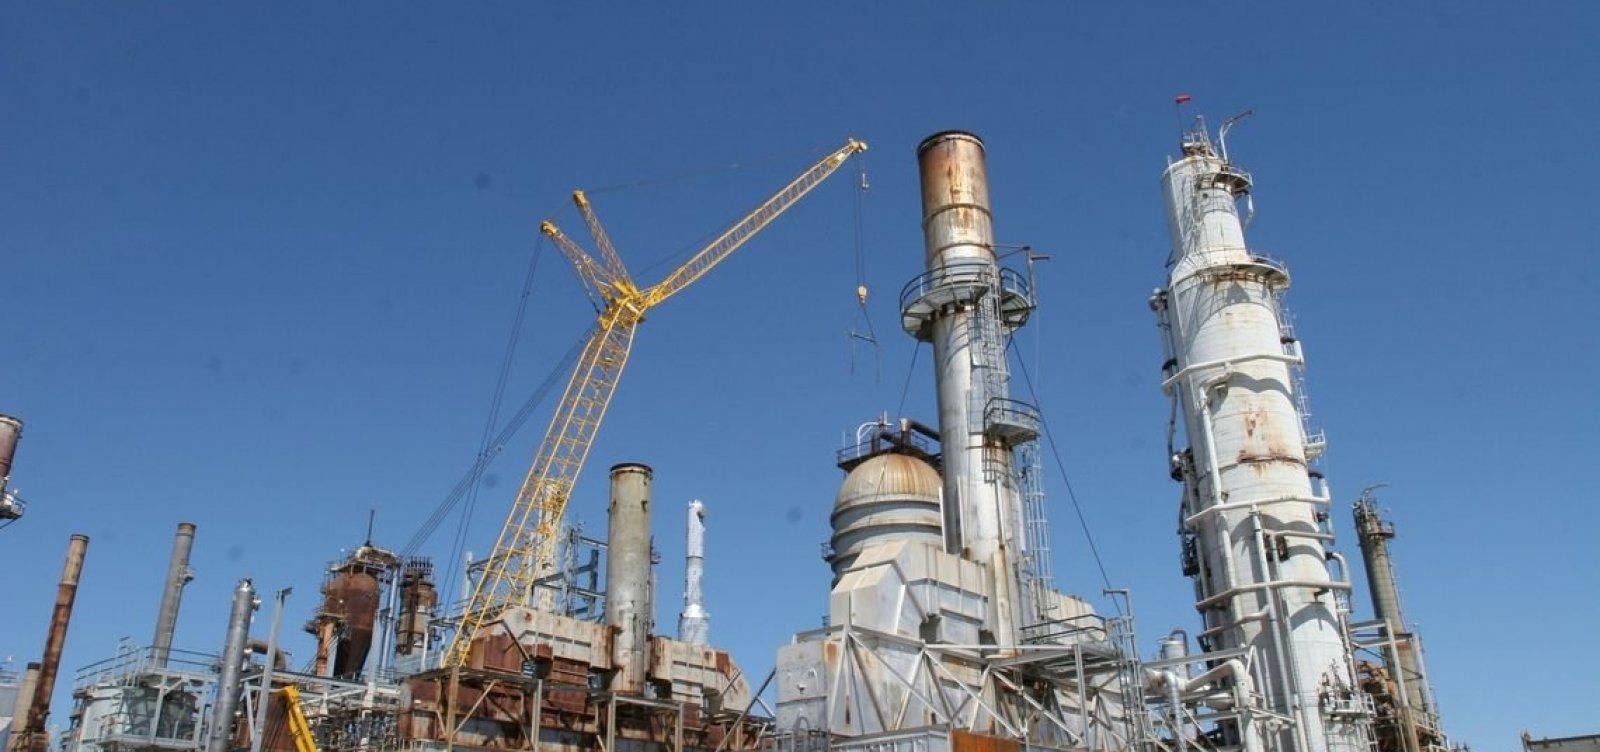 Fachin suspende venda de refinarias da Petrobras e TAG